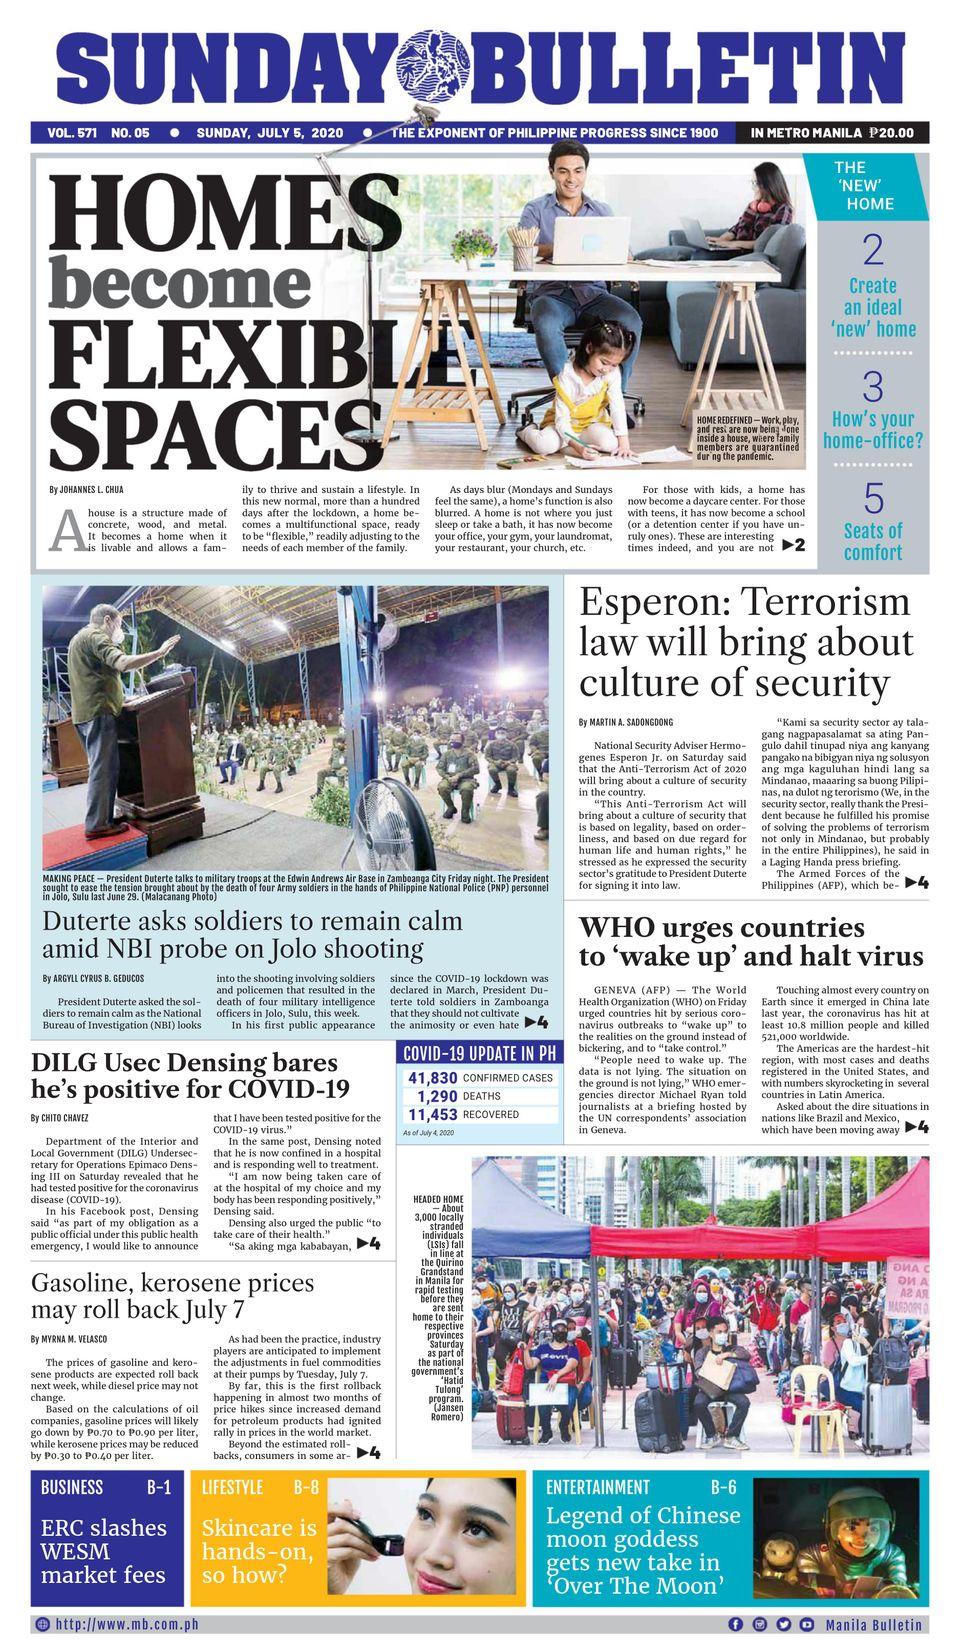 Manila Bulletin-July 5, 2020 Newspaper - Get Your Digital